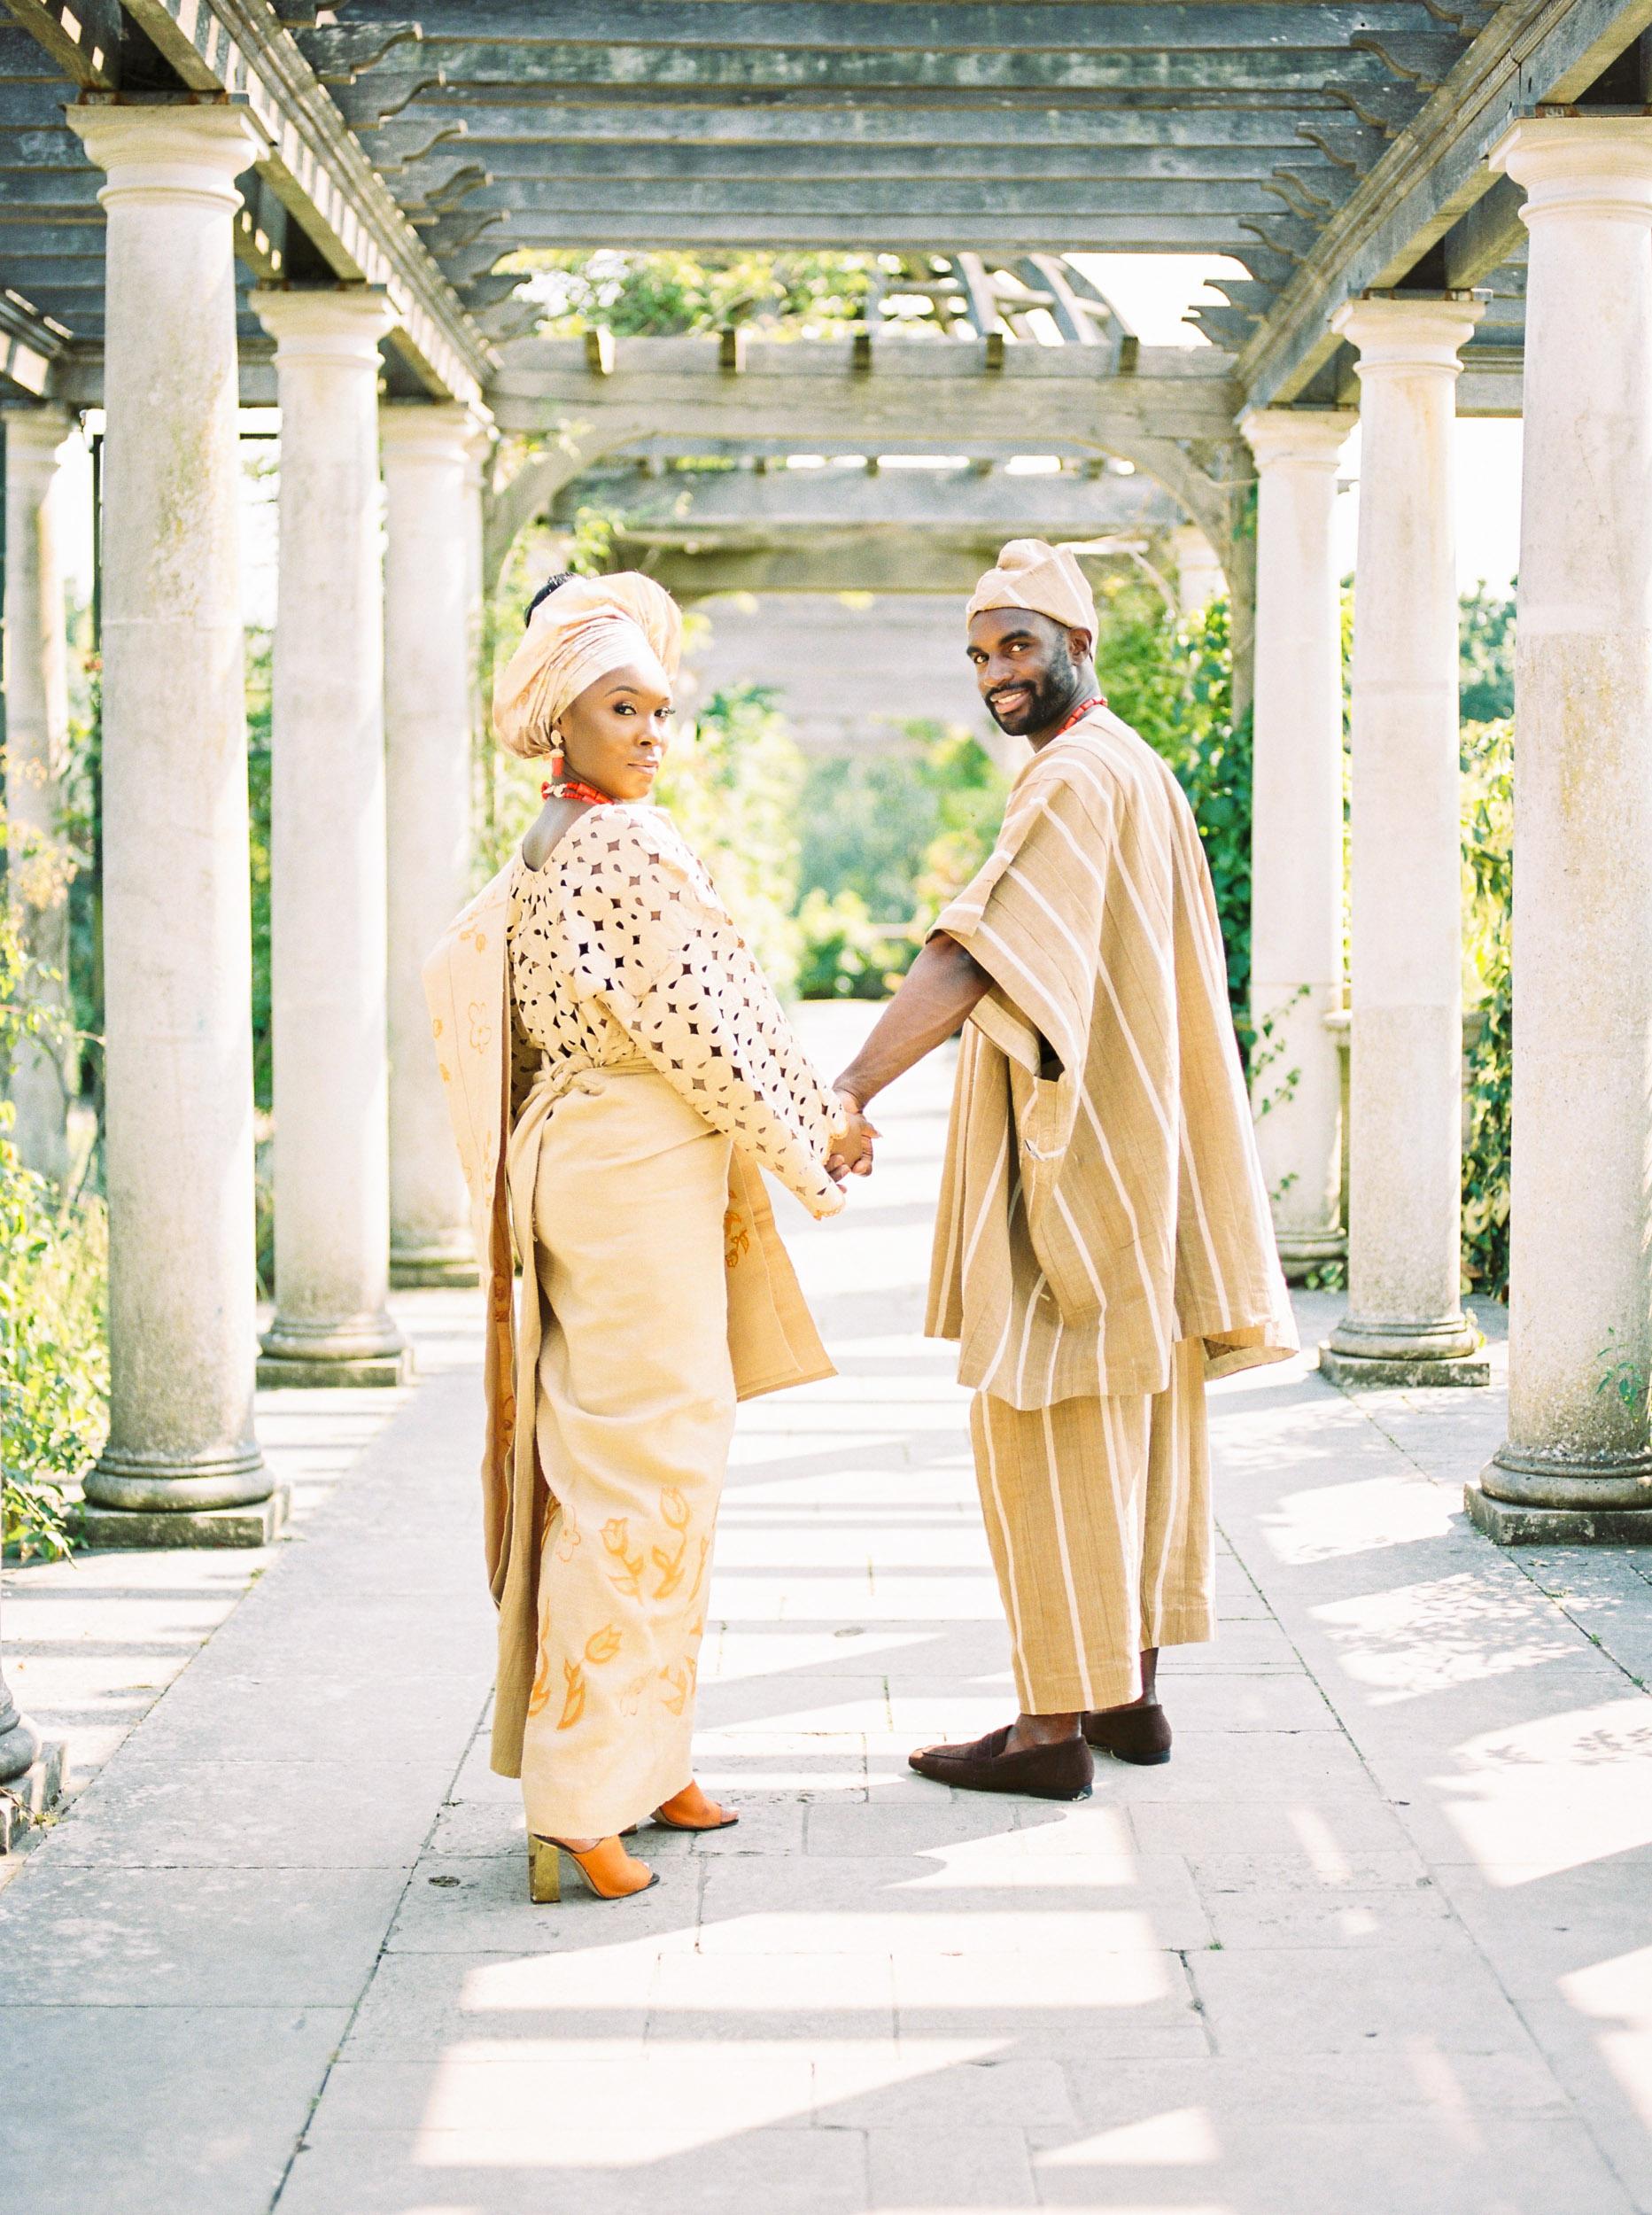 Amy O'Boyle Photography- Destination & UK Fine Art Film Wedding Photographer- The Pergola and Hill Garden Wedding-46.jpg